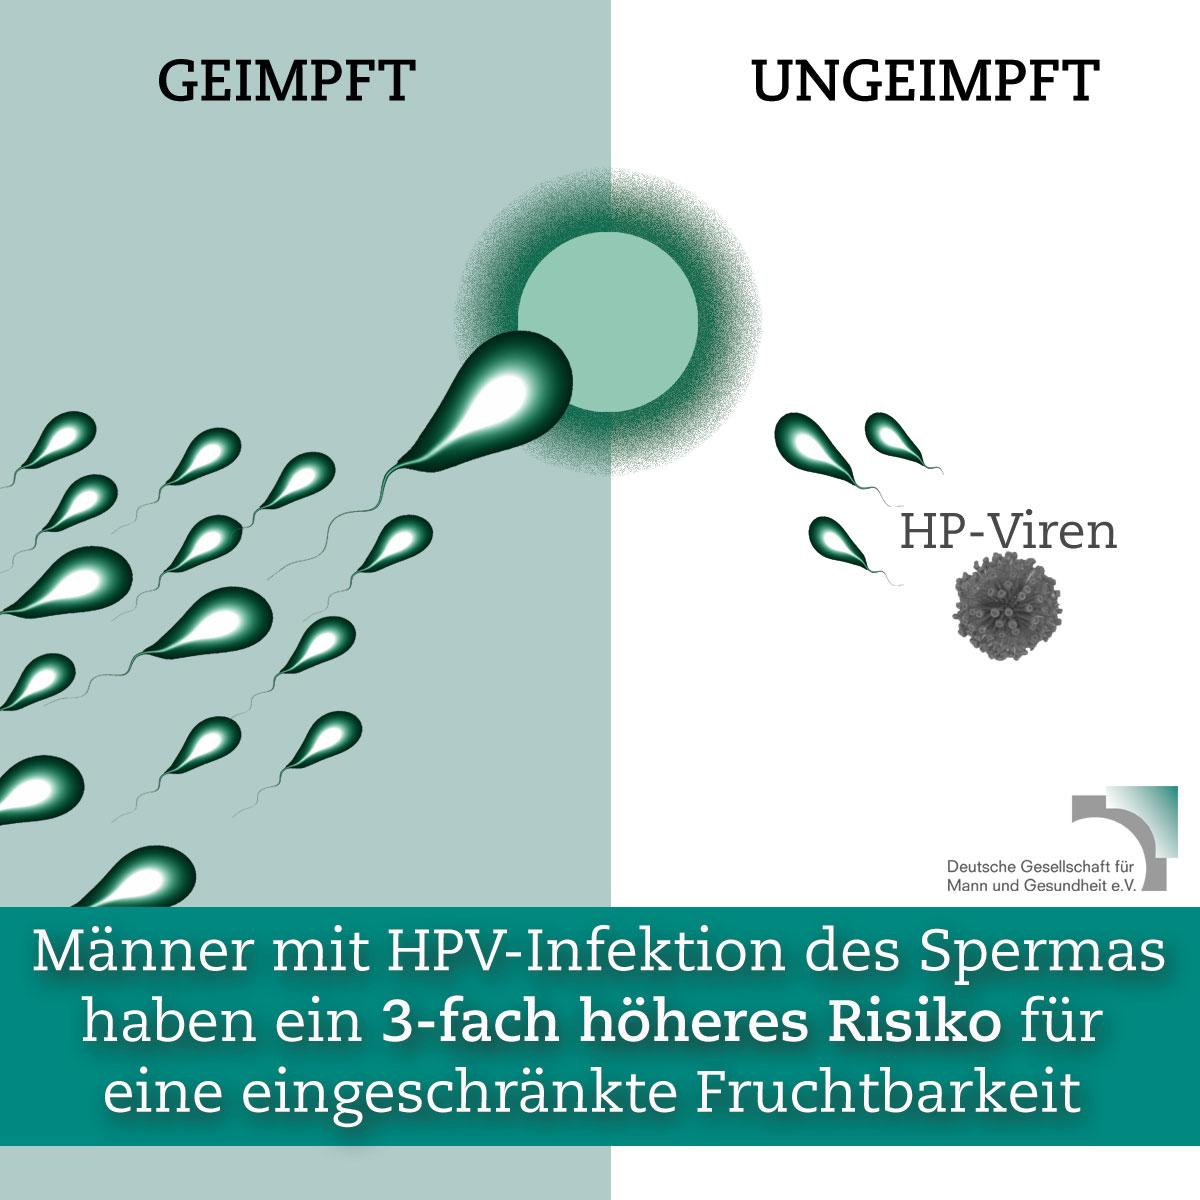 Viren männern hpv bei Universitätsklinikum Heidelberg: